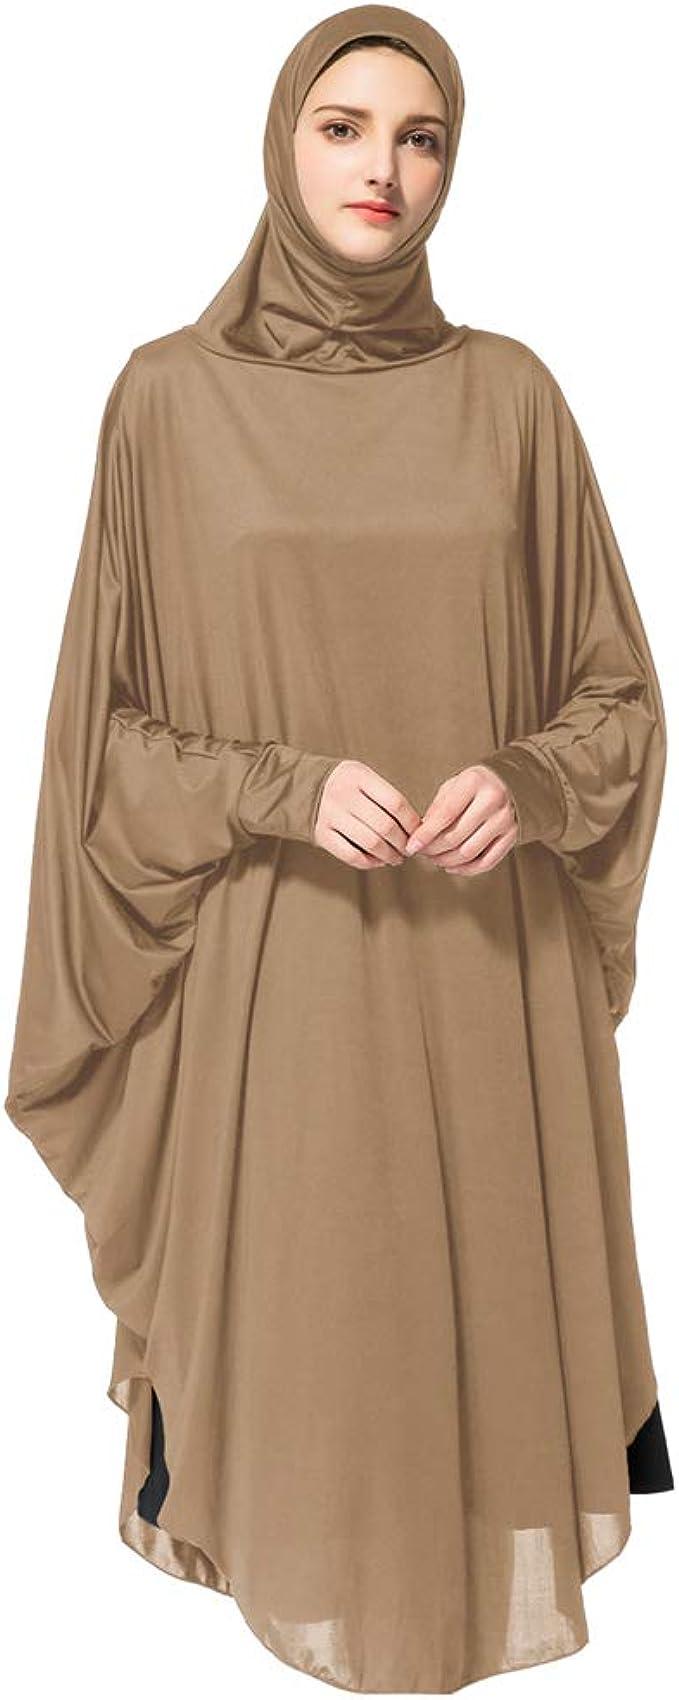 BaronHong Mujeres musulmanas árabes Islámica Abaya Ramadan Bata Kaftan Bata con Hijab: Amazon.es: Ropa y accesorios